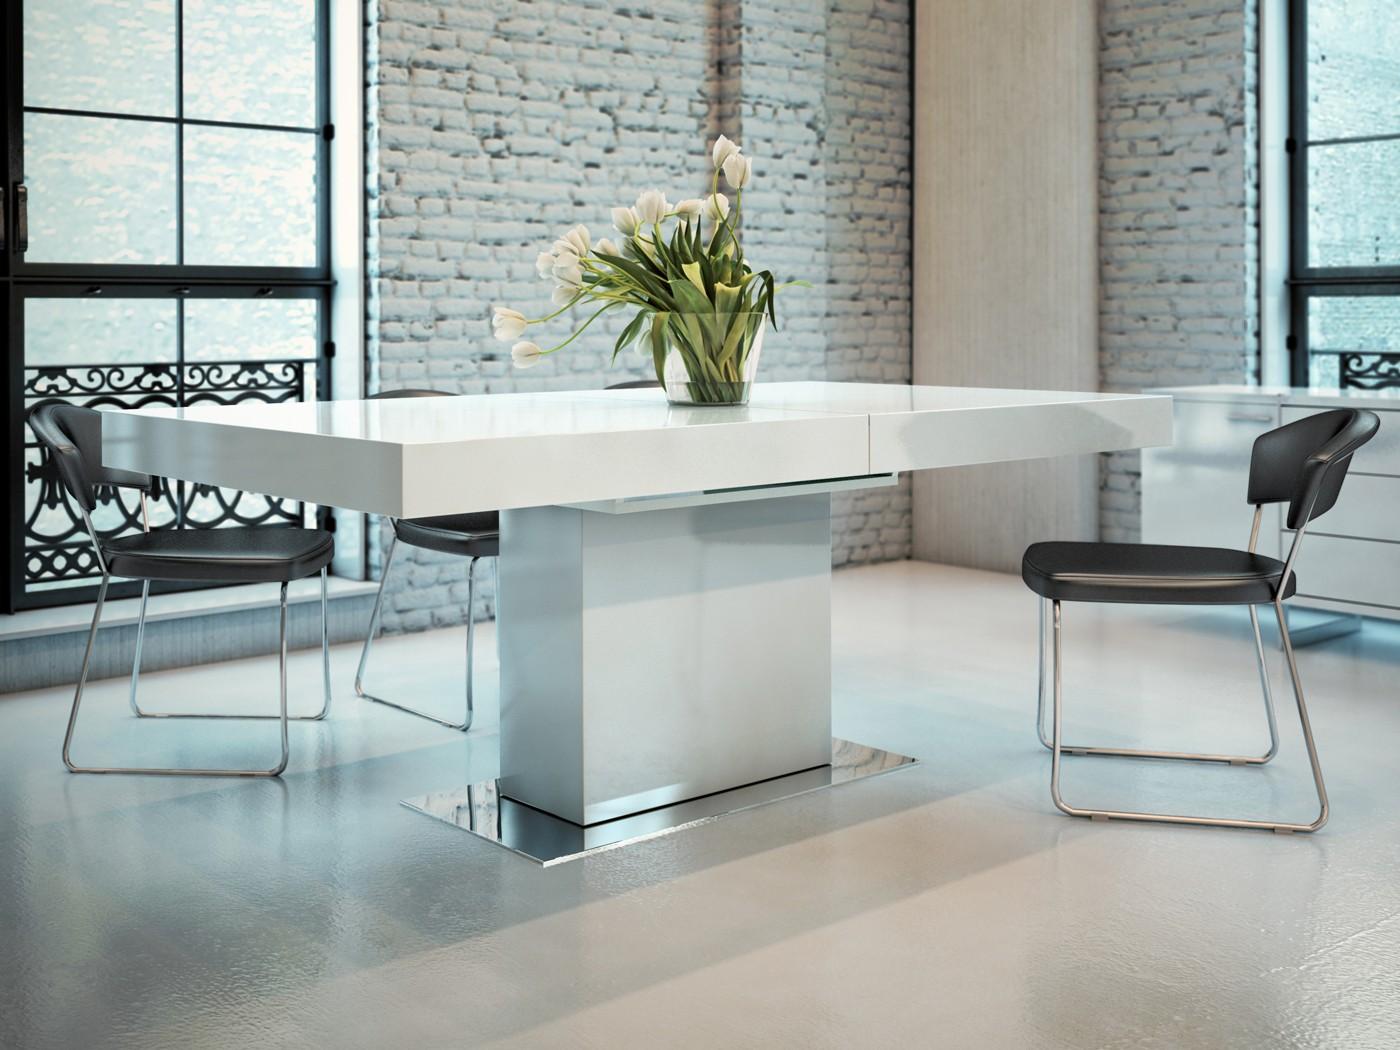 Astor modern dining table by Modloft